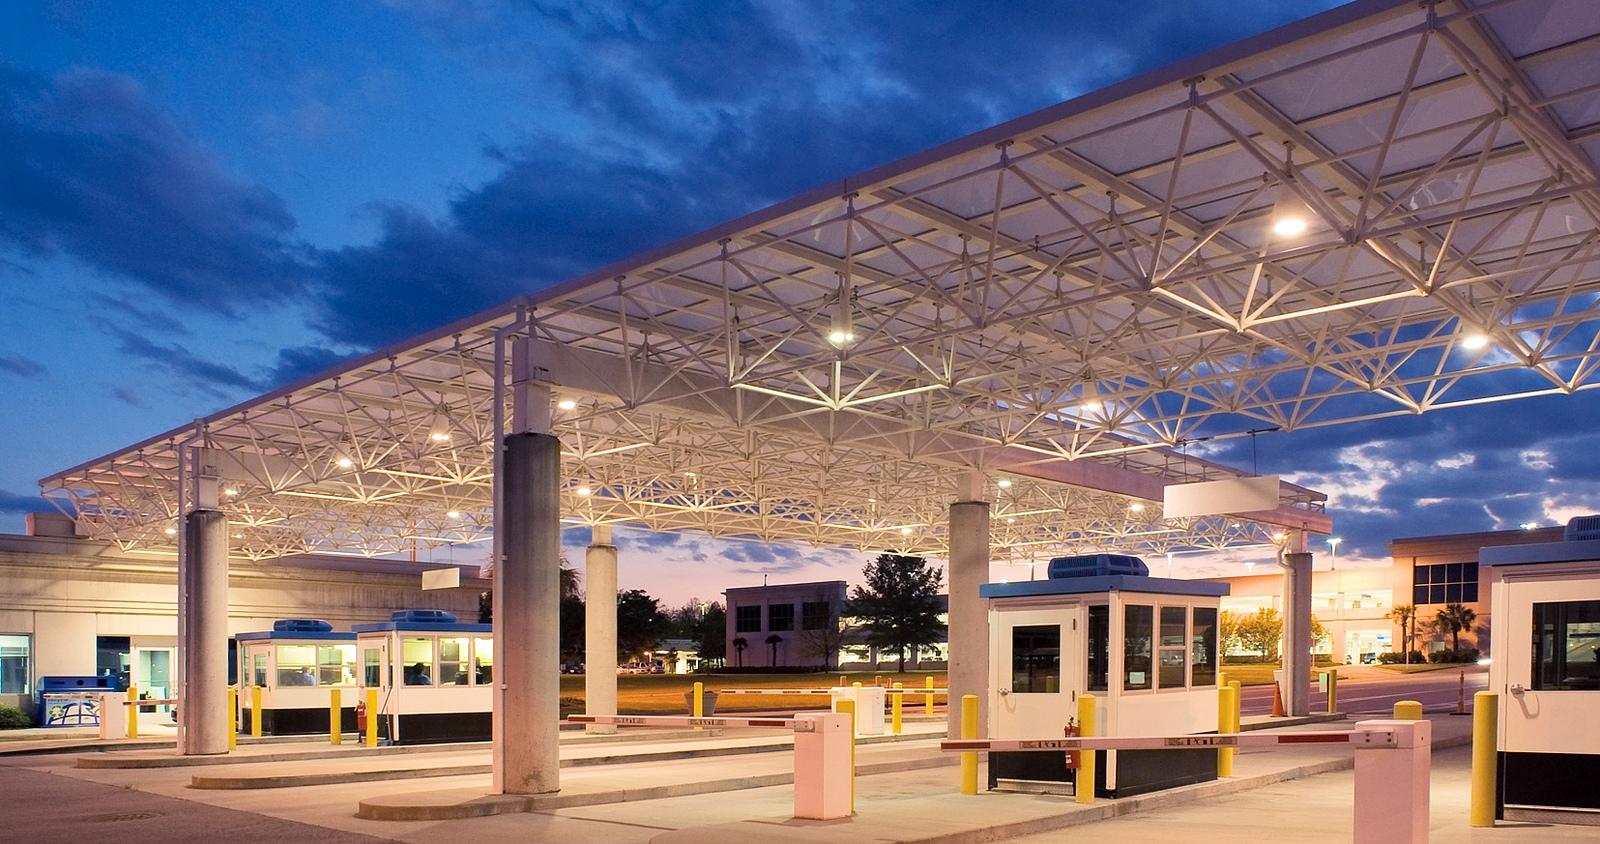 Columbia City Airport entrance canopy, Columbia, SC, USA